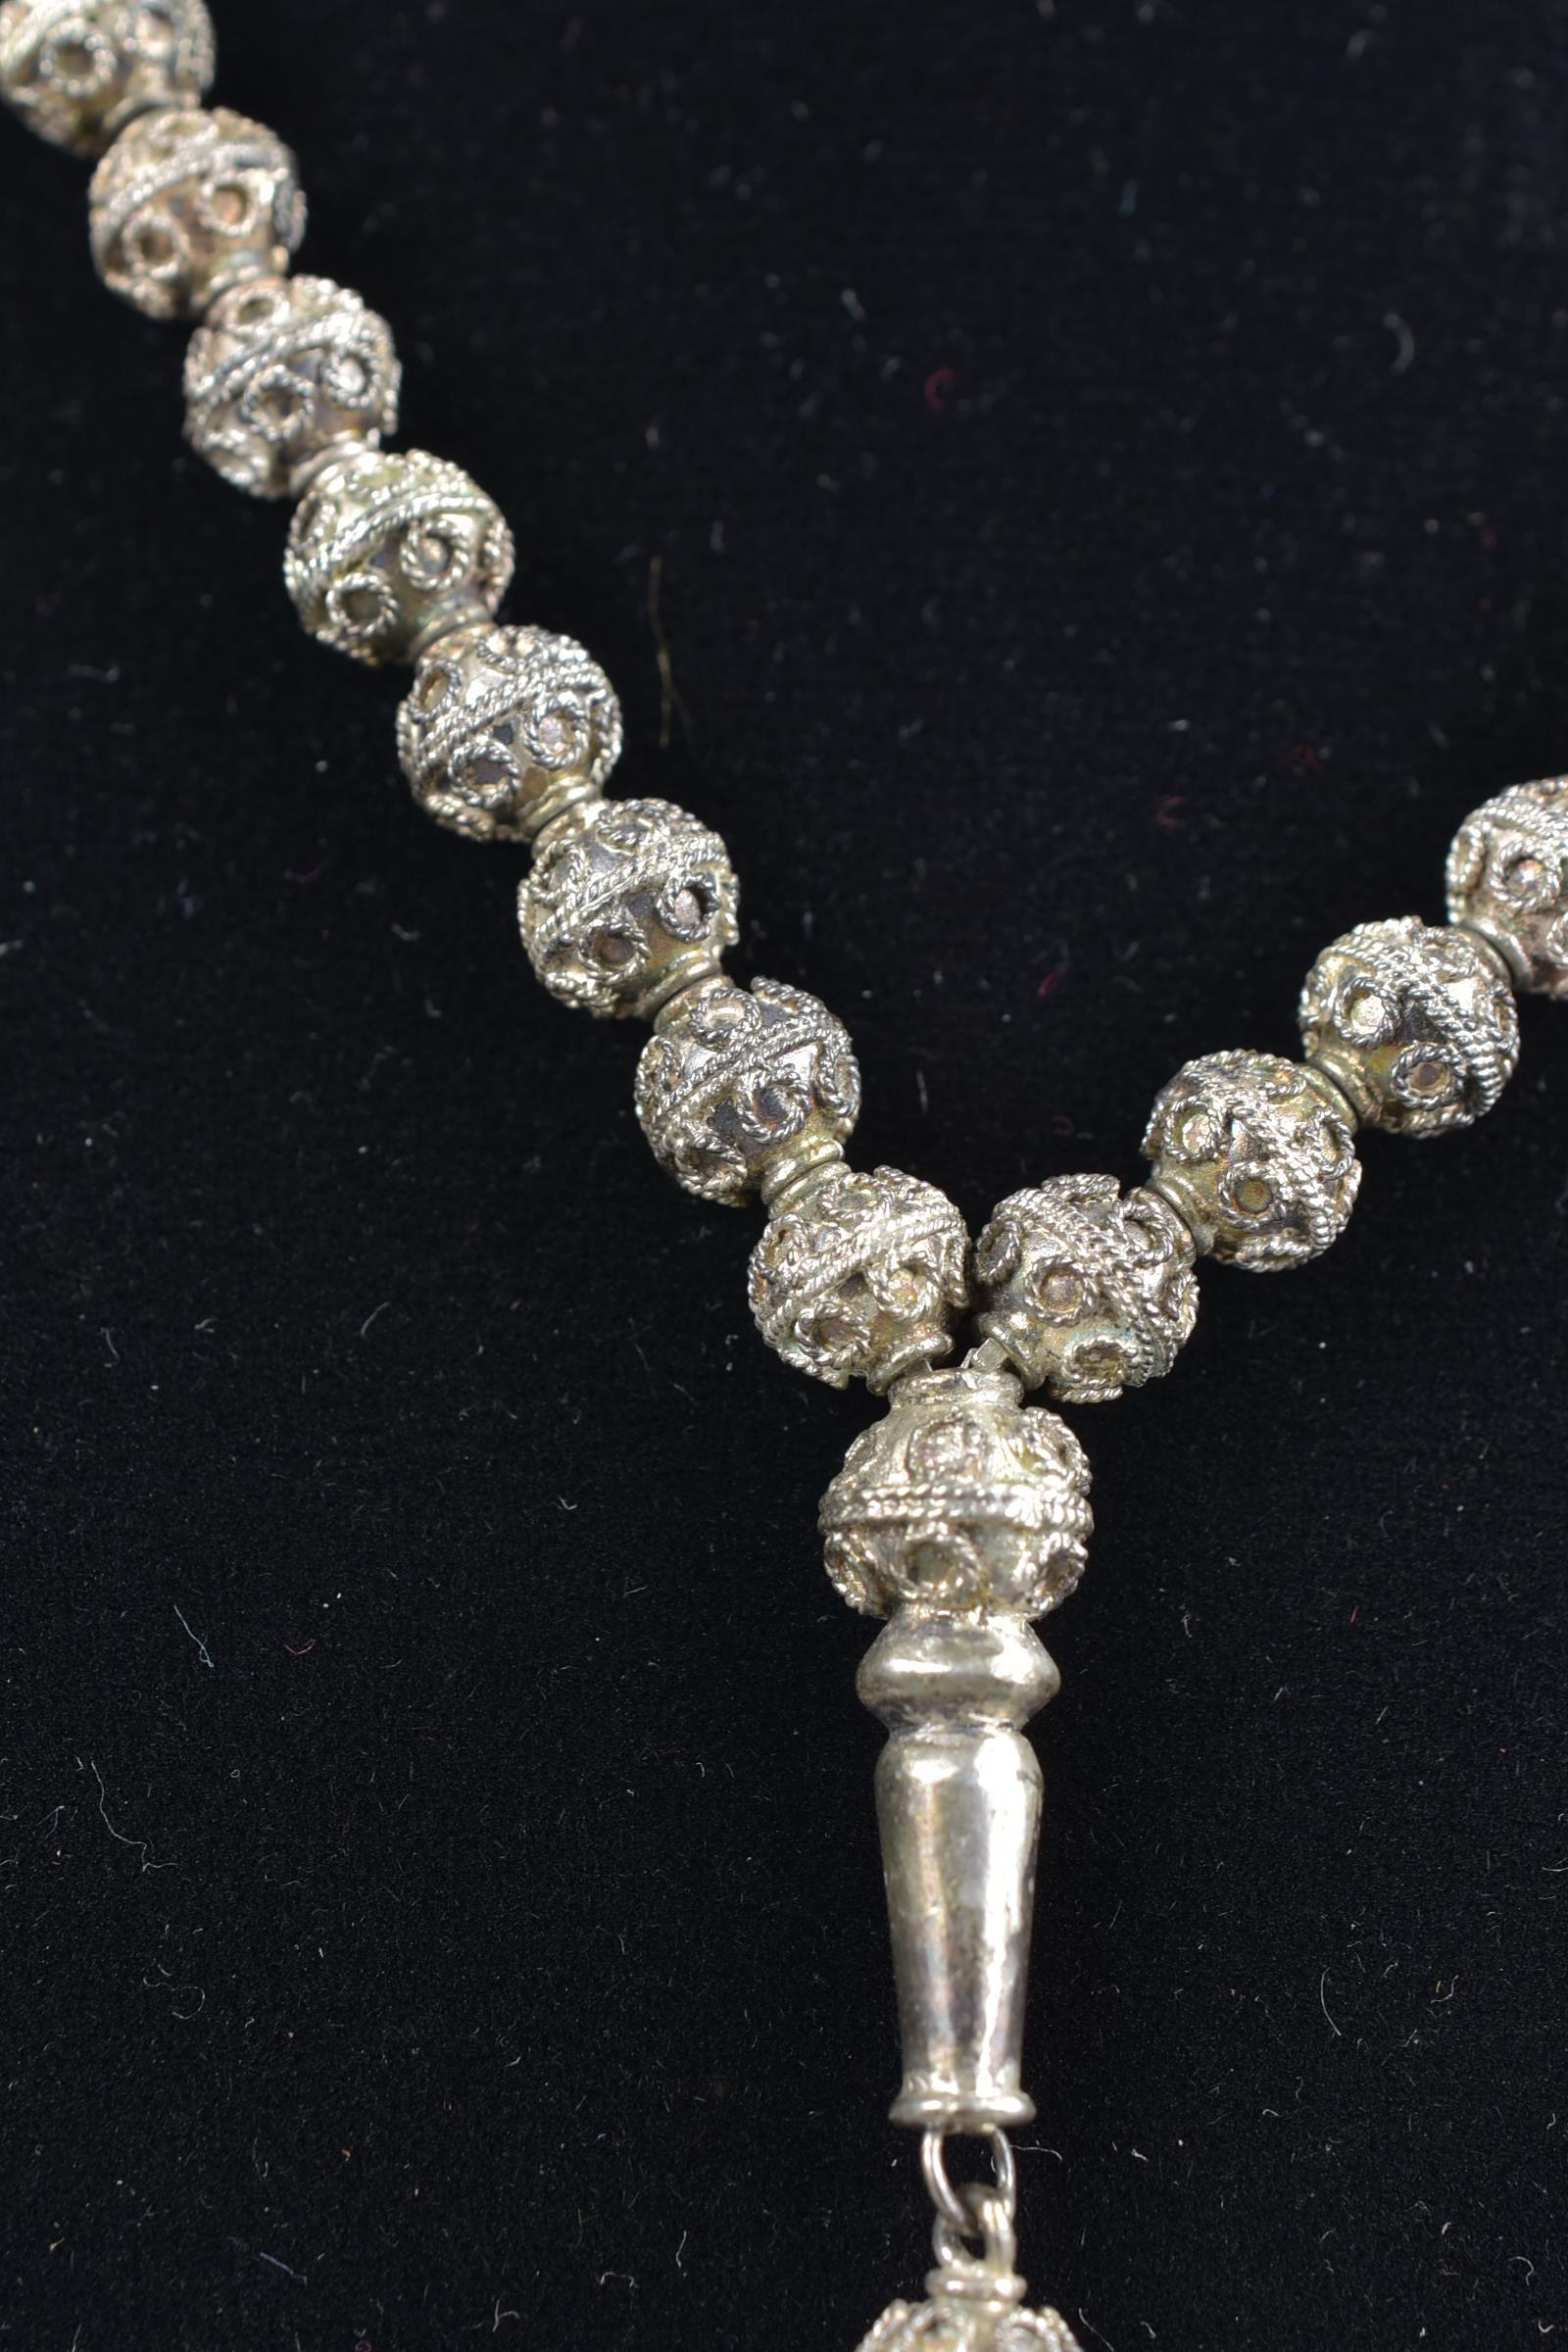 Lot 44 - Islamic 19/20th century silver-coloured metal prayer bead necklace